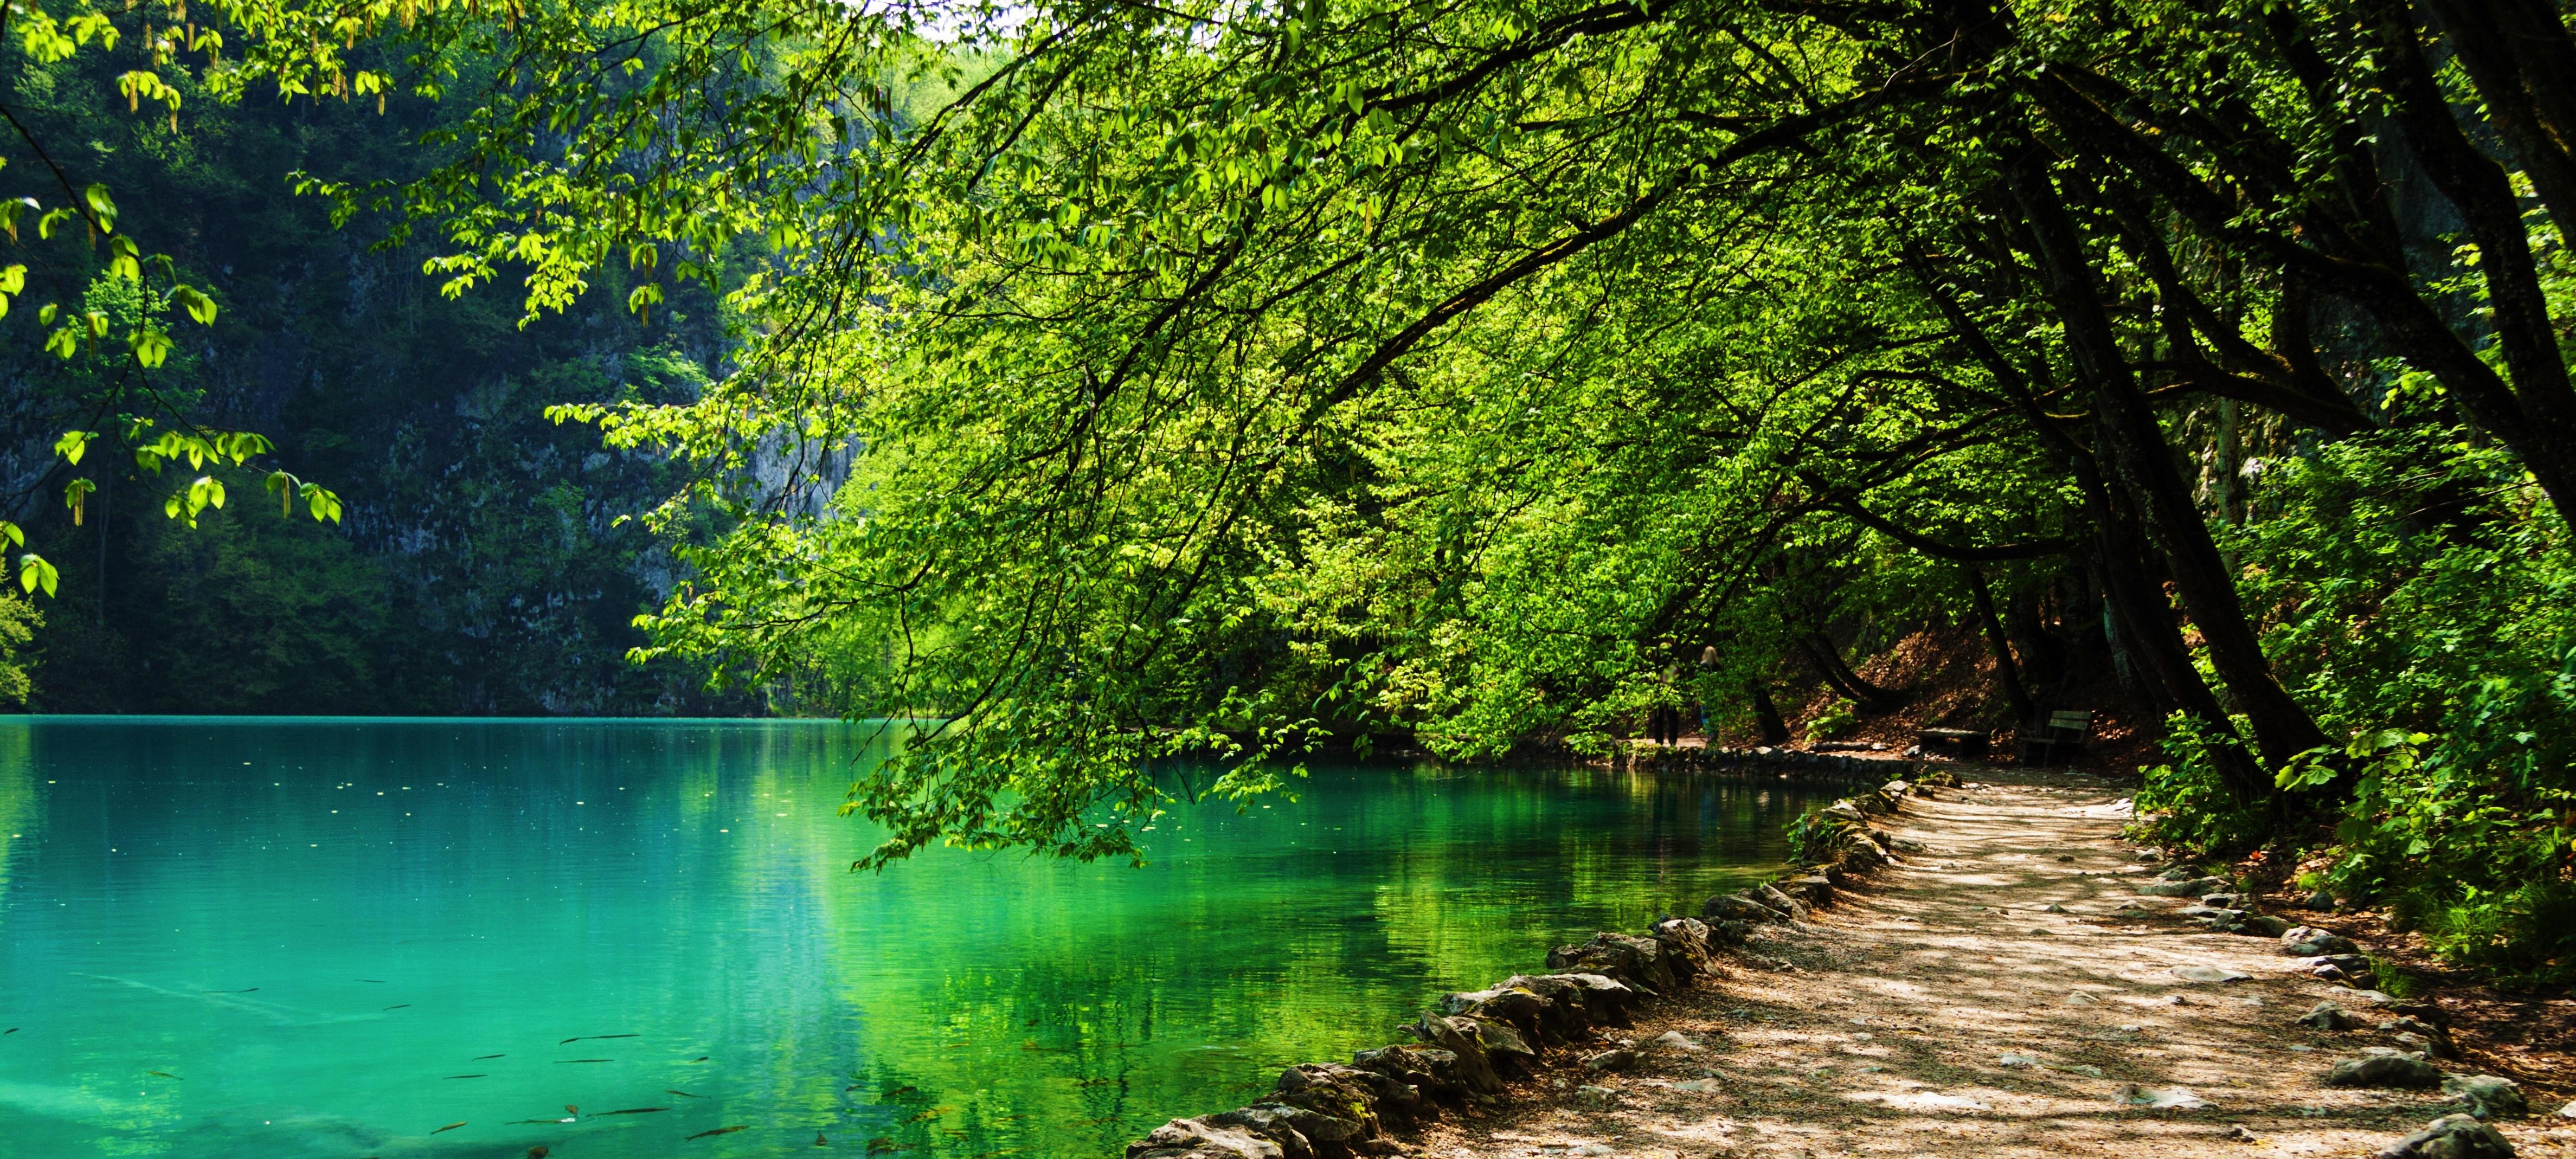 Path Near A Forest Lake | fotoPhox